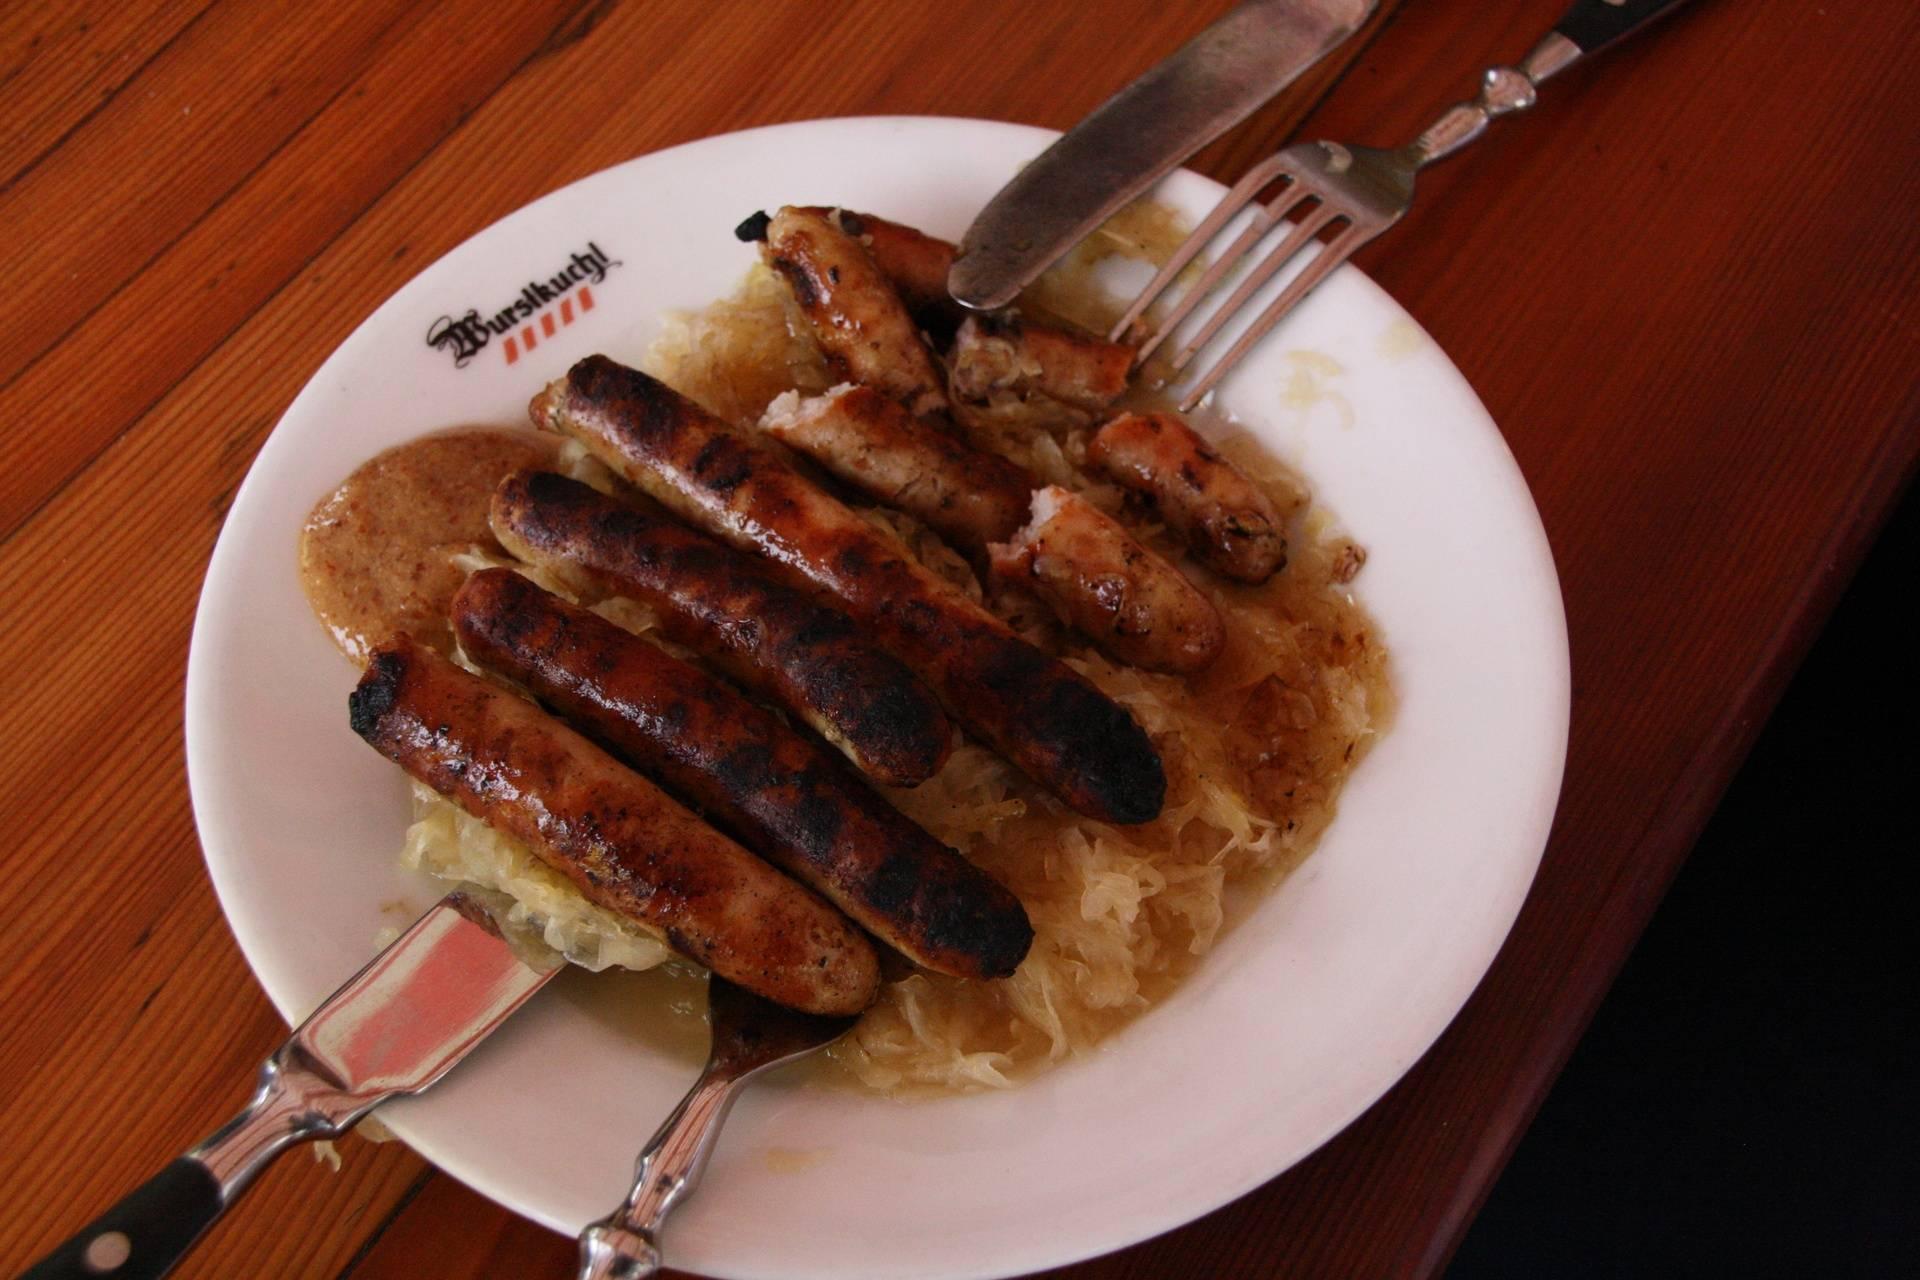 Plate of sausages in Regensburg